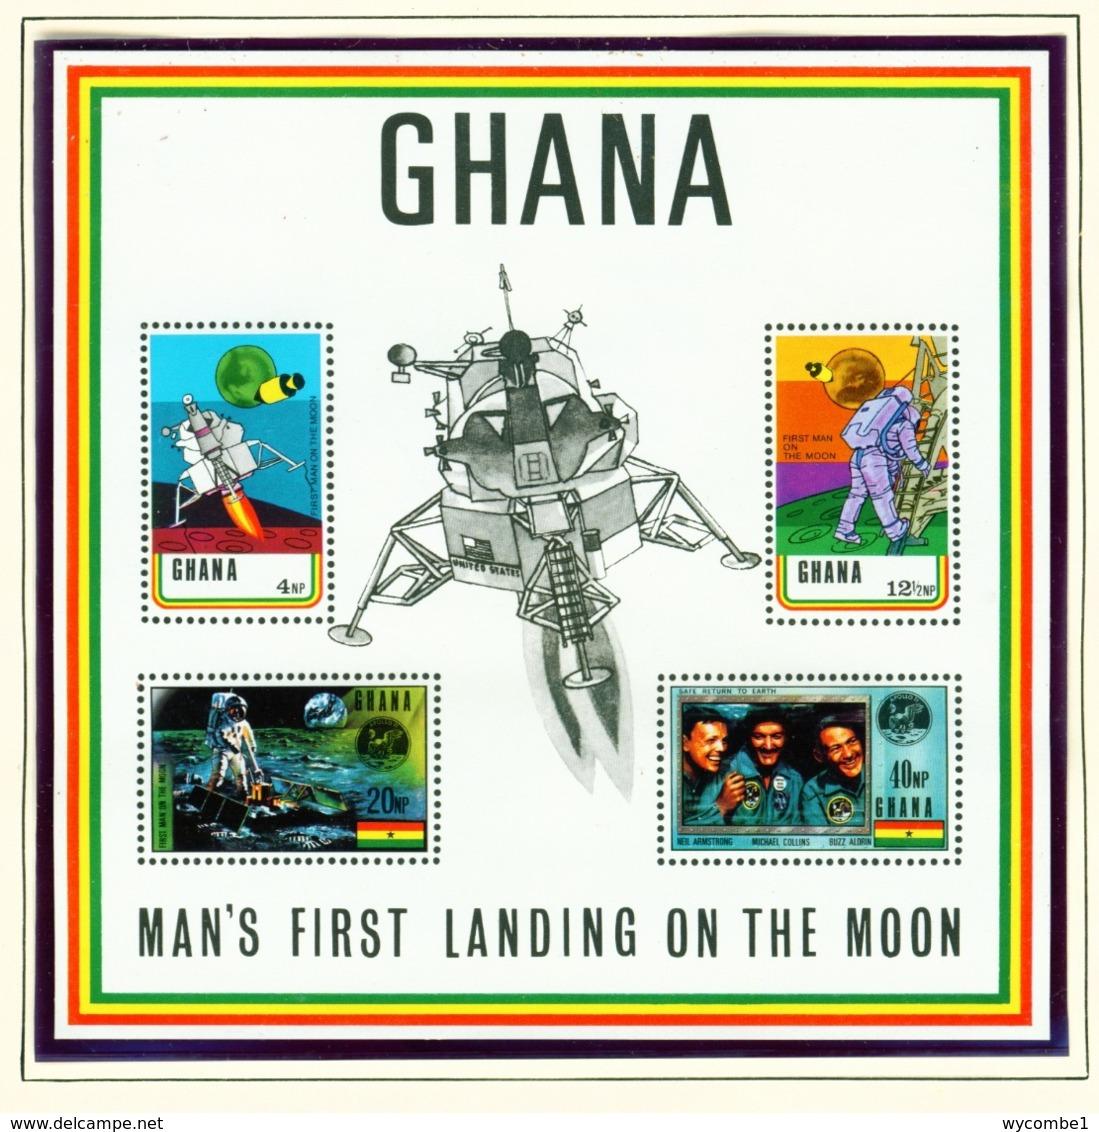 GHANA  -  1970 Moon Landing Miniature Sheet Imperf With Printed Perfs Unmounted/Never Hinged Mint - Ghana (1957-...)